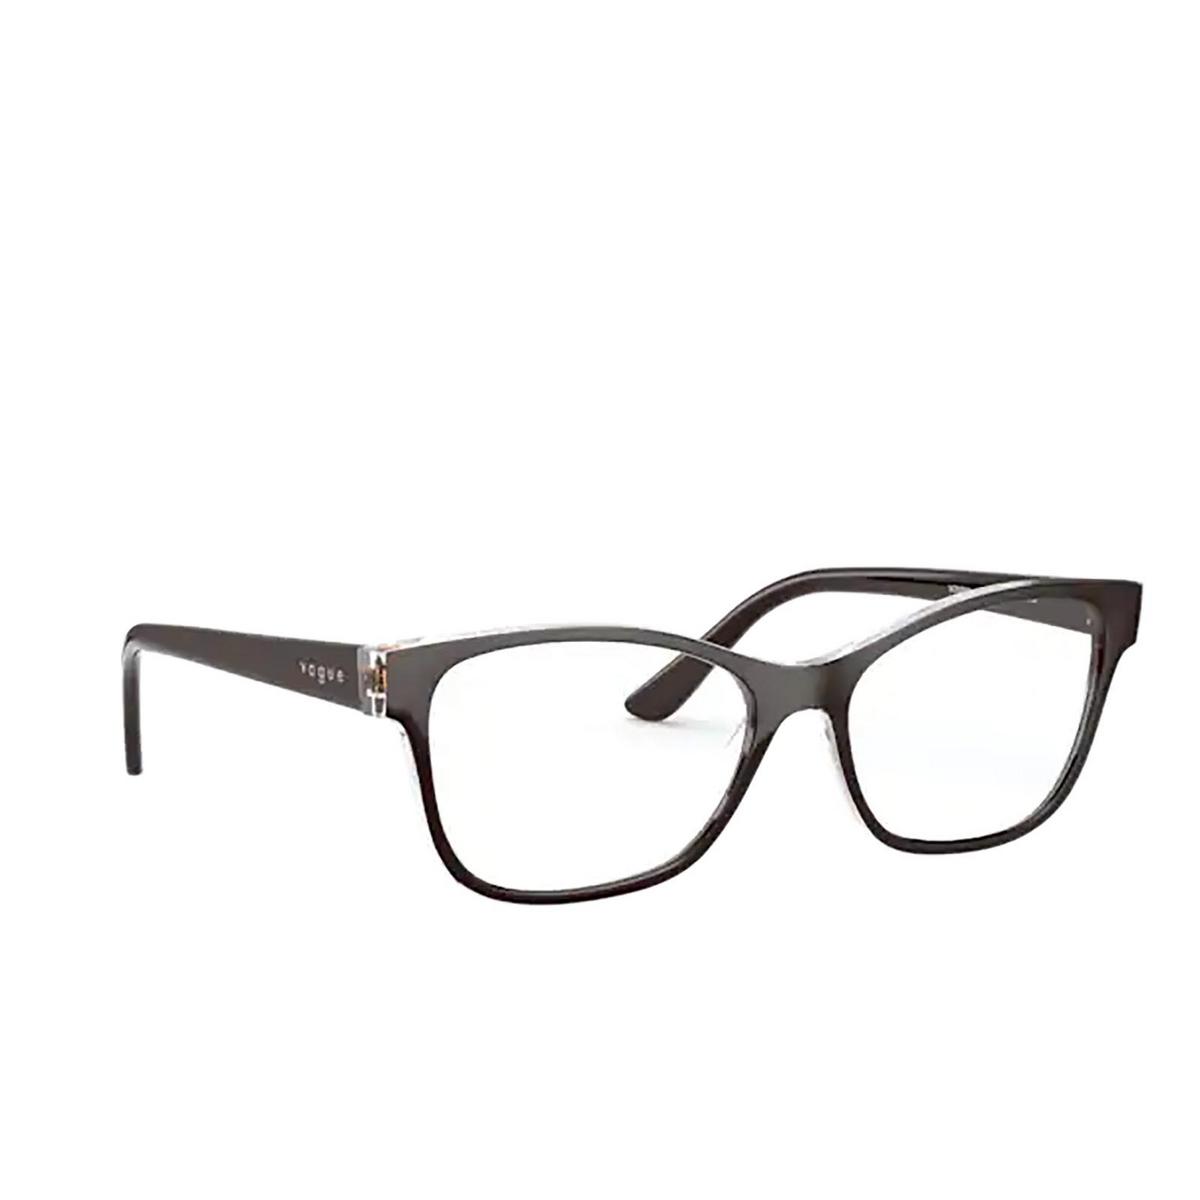 Vogue® Square Eyeglasses: VO5335 color Top Brown / Serigraphy 2842.